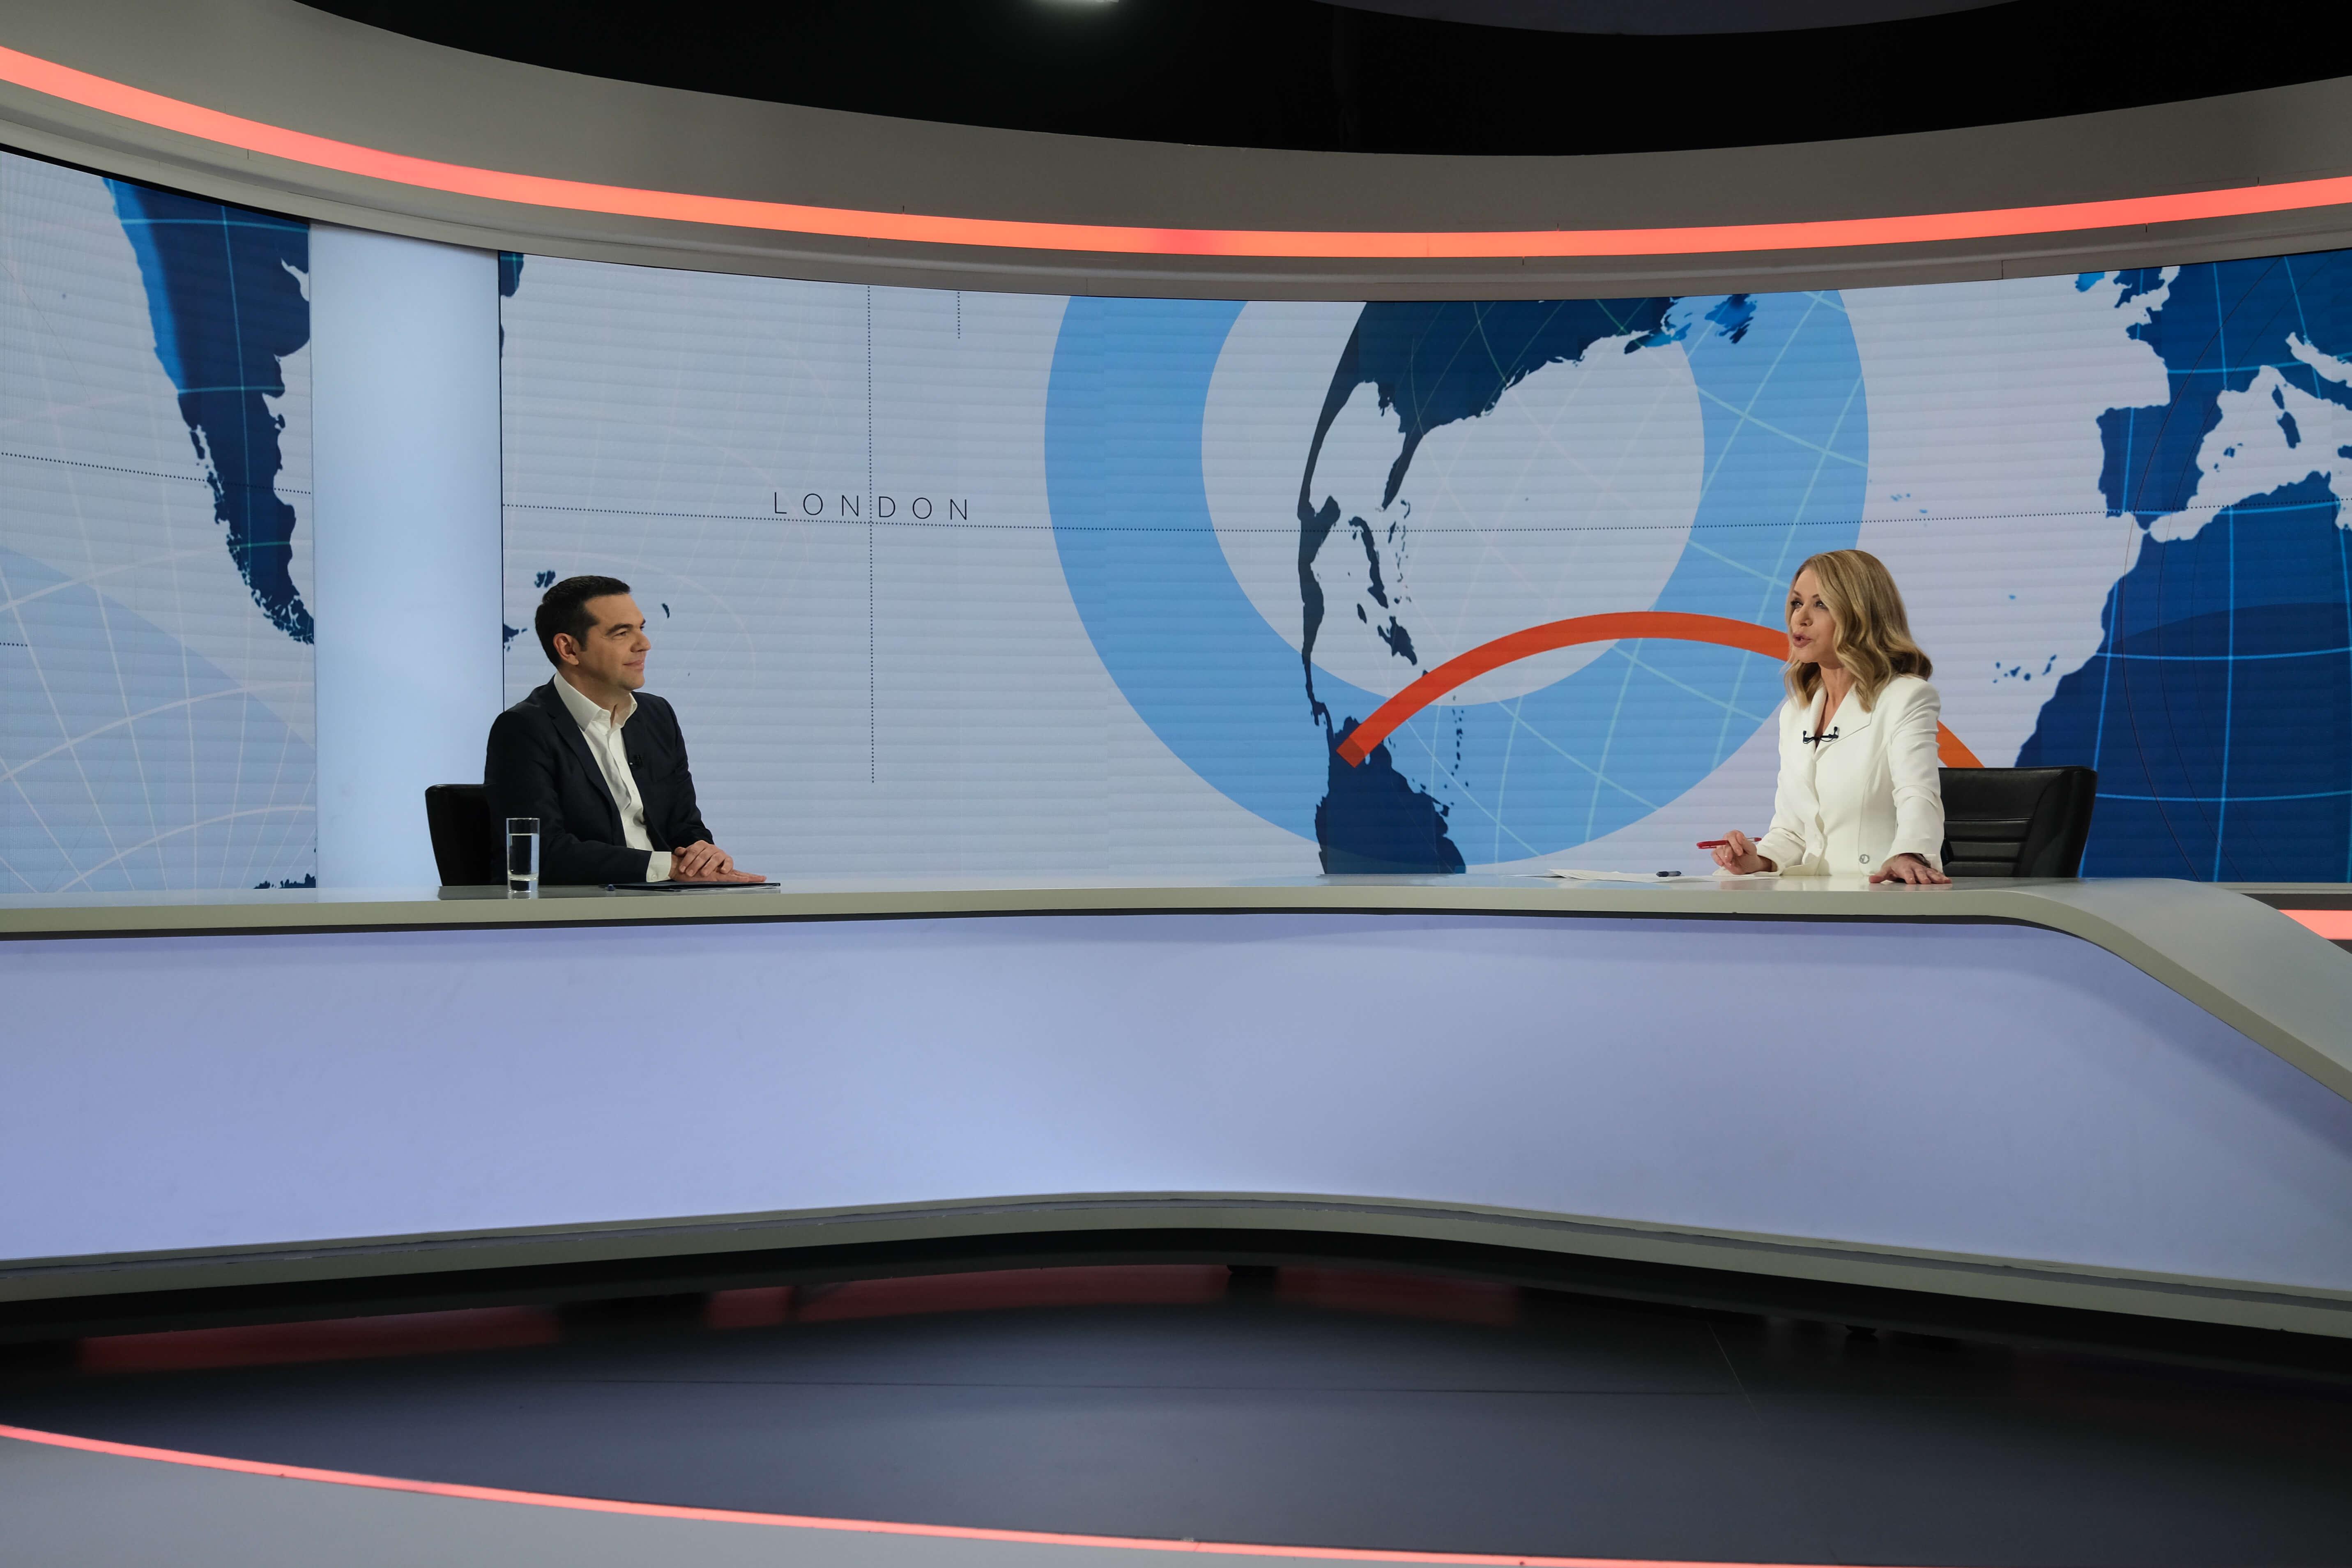 Open: Έρευνα, ΕΔΕ και μηνύσεις για τη διαρροή του video με Τσίπρα και Στάη | Newsit.gr